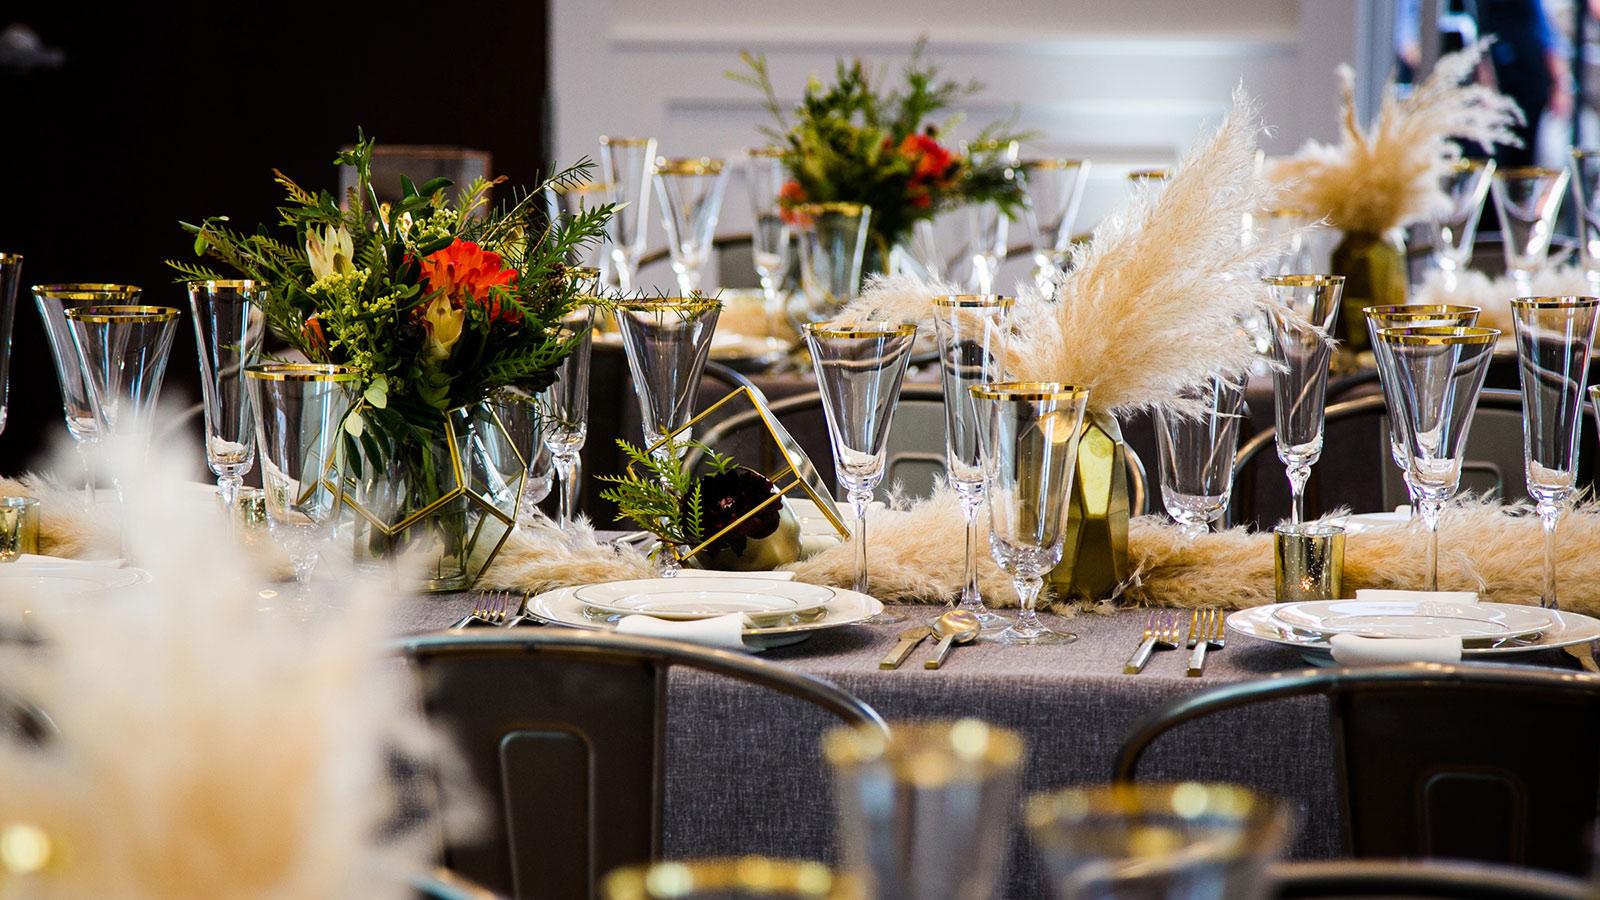 Falls Event Center wedding reception